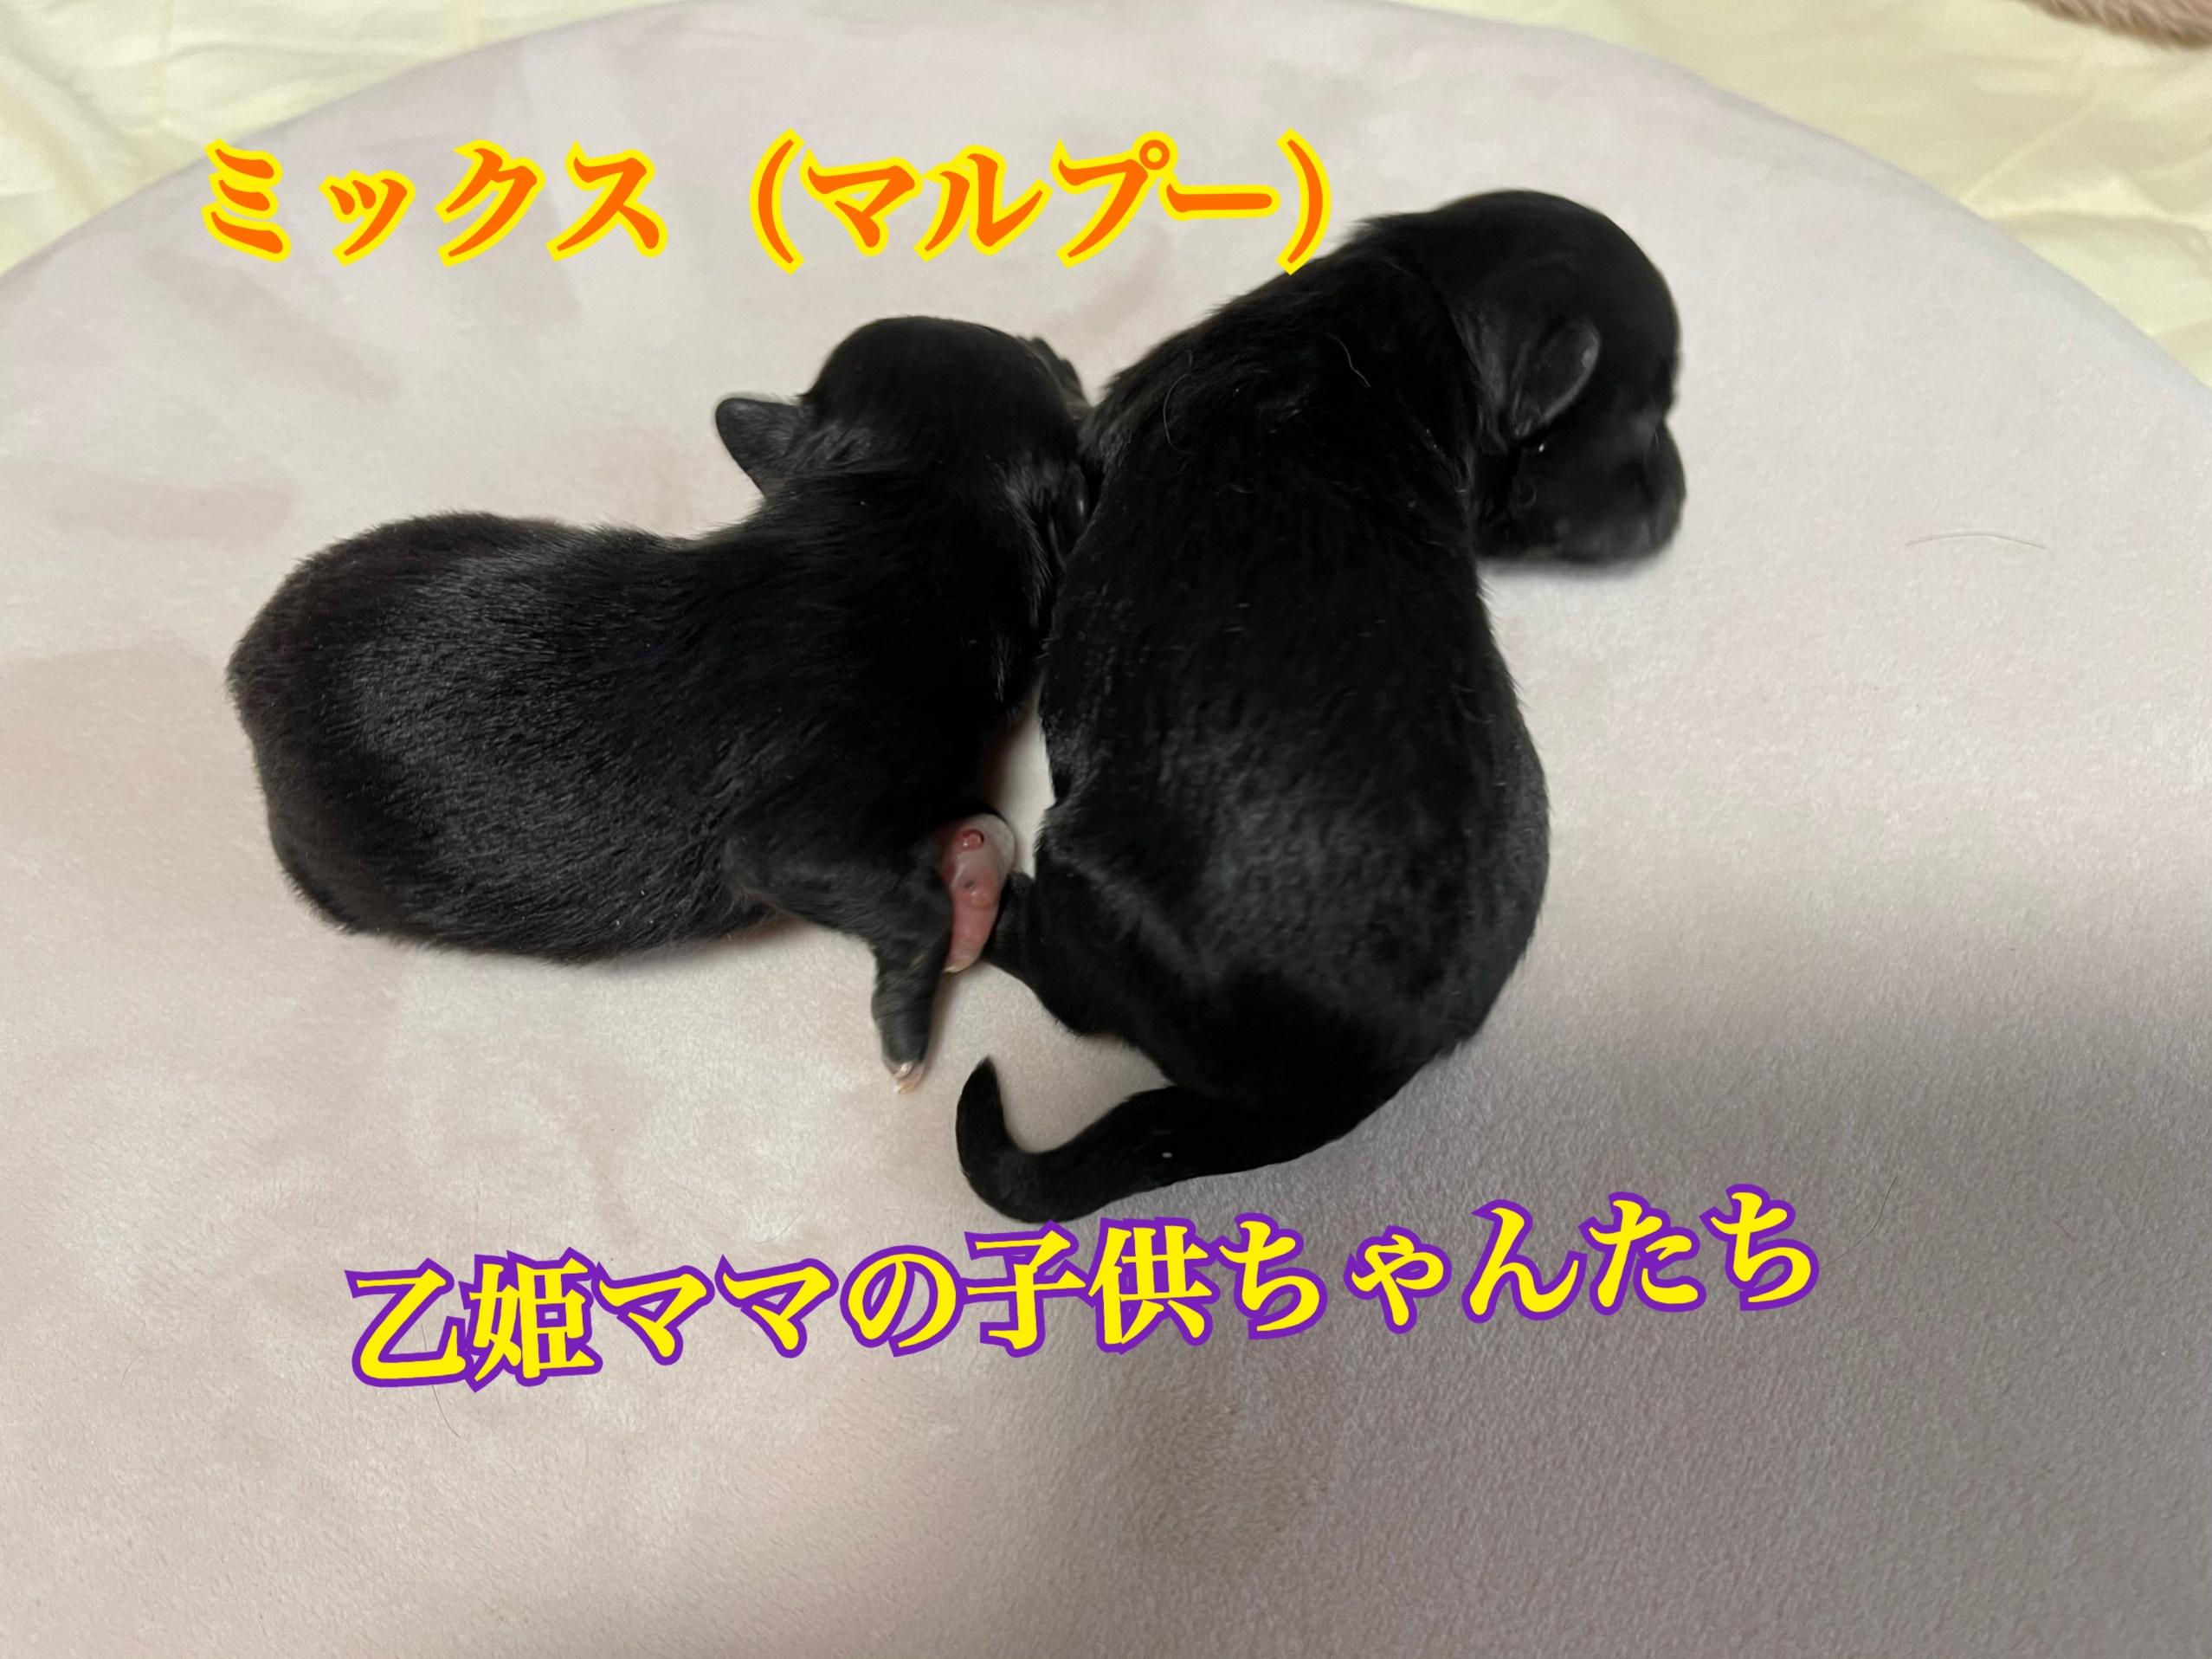 mix犬 ミックス犬 マルプー 男の子 仔犬販売